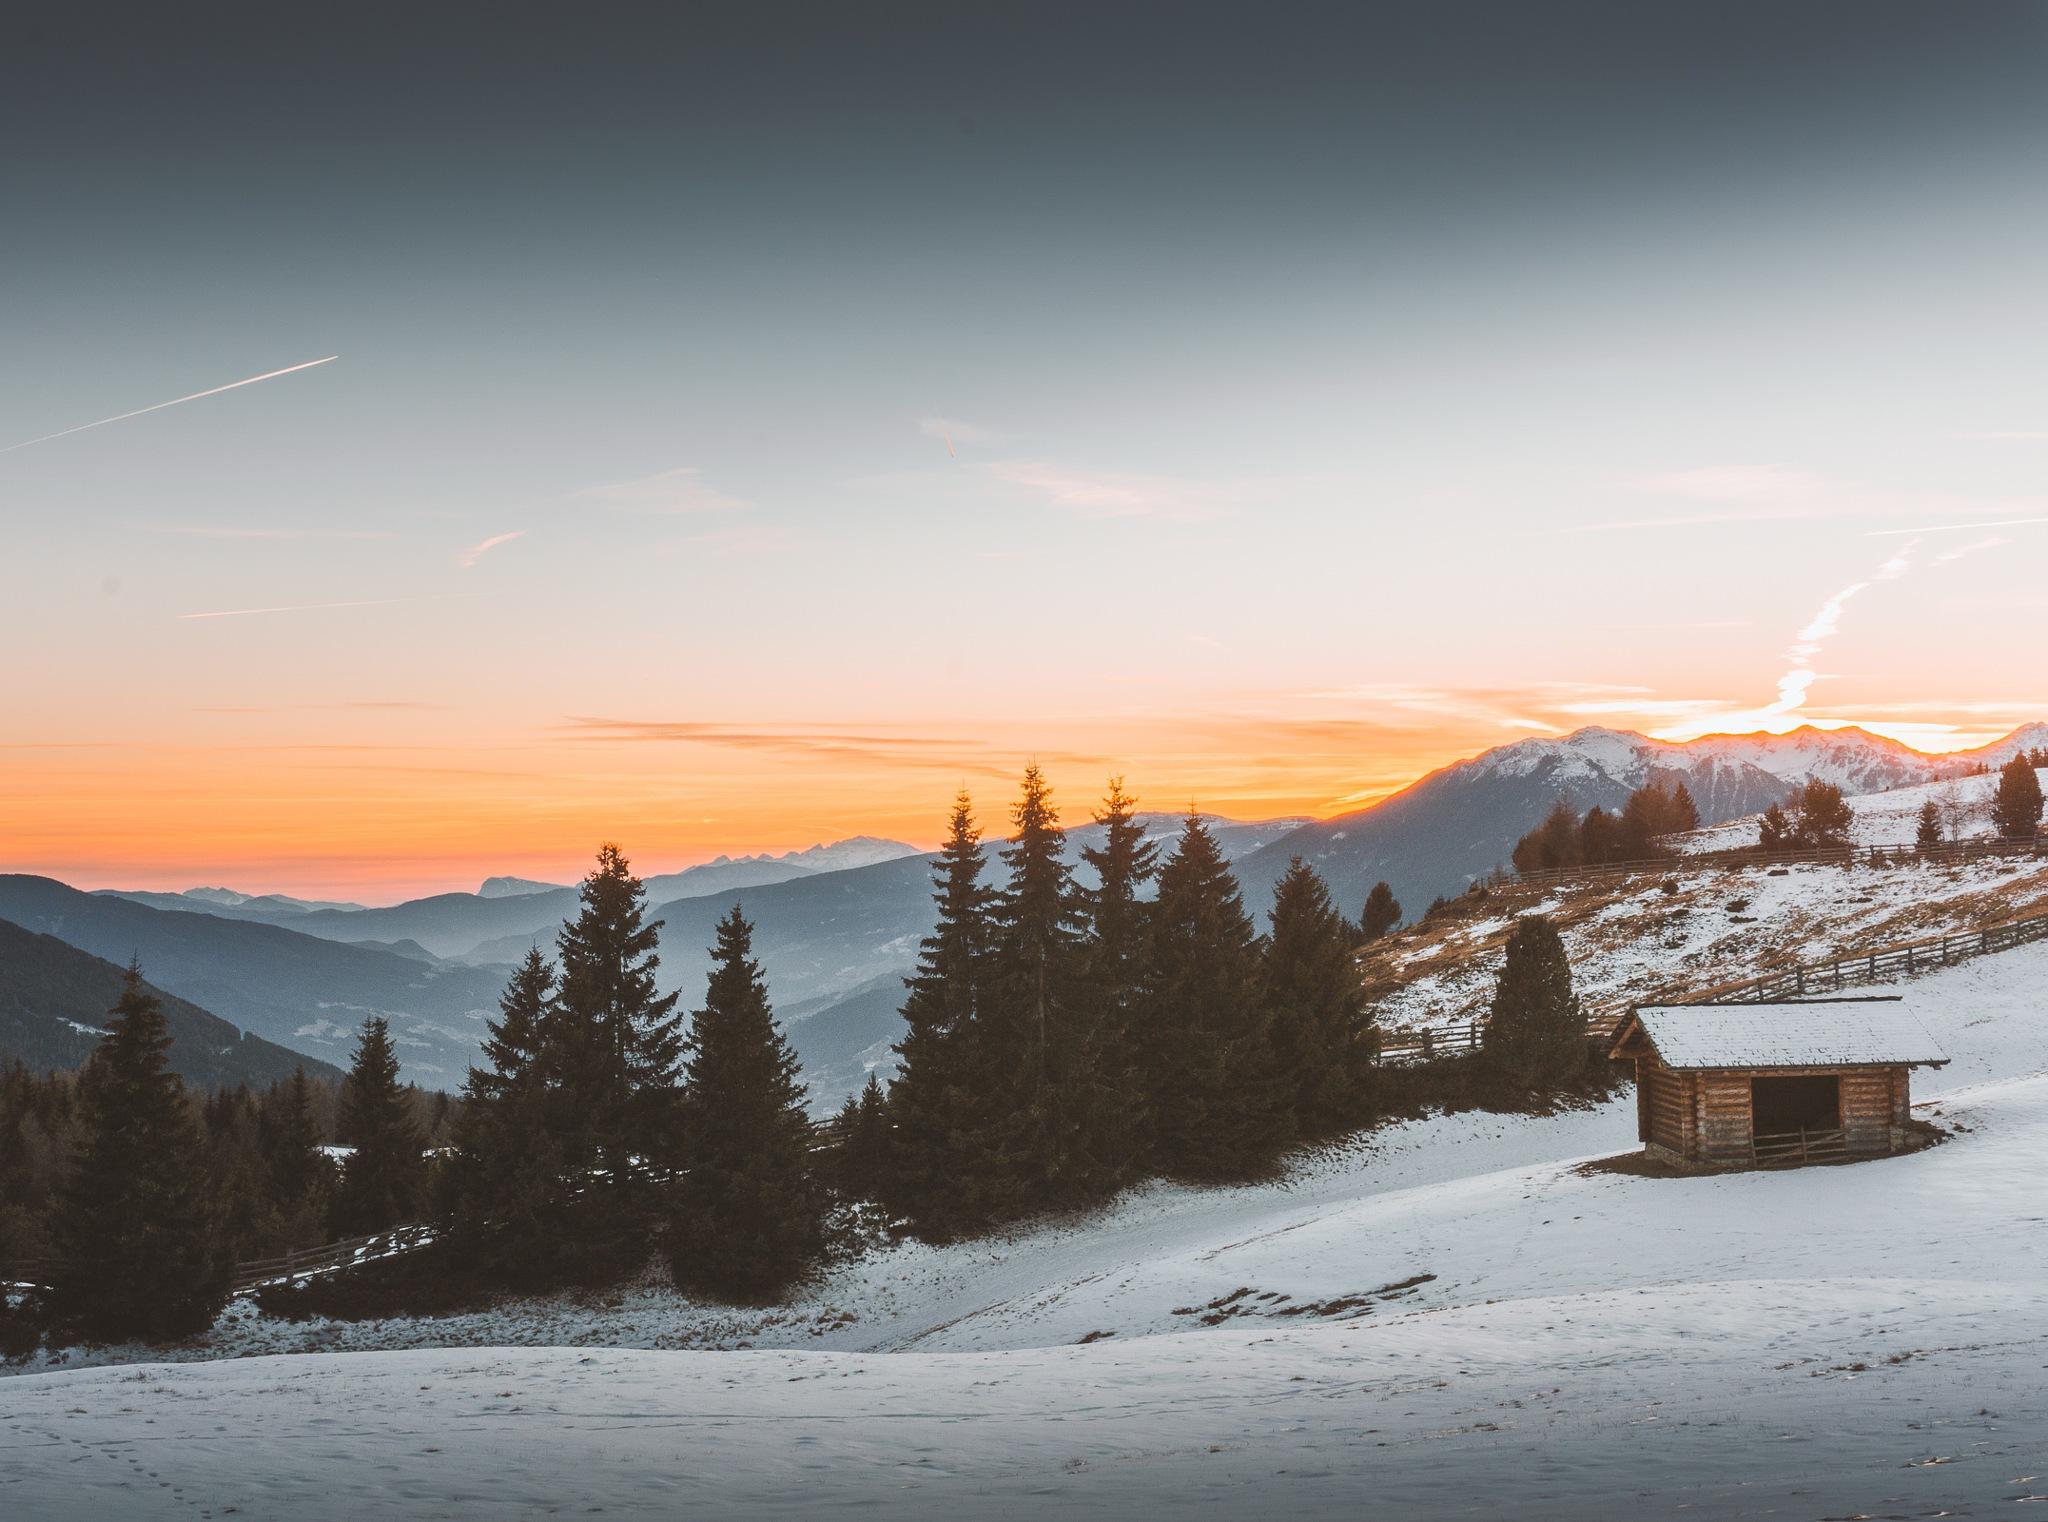 Magic Sunset by Markus Denicolo